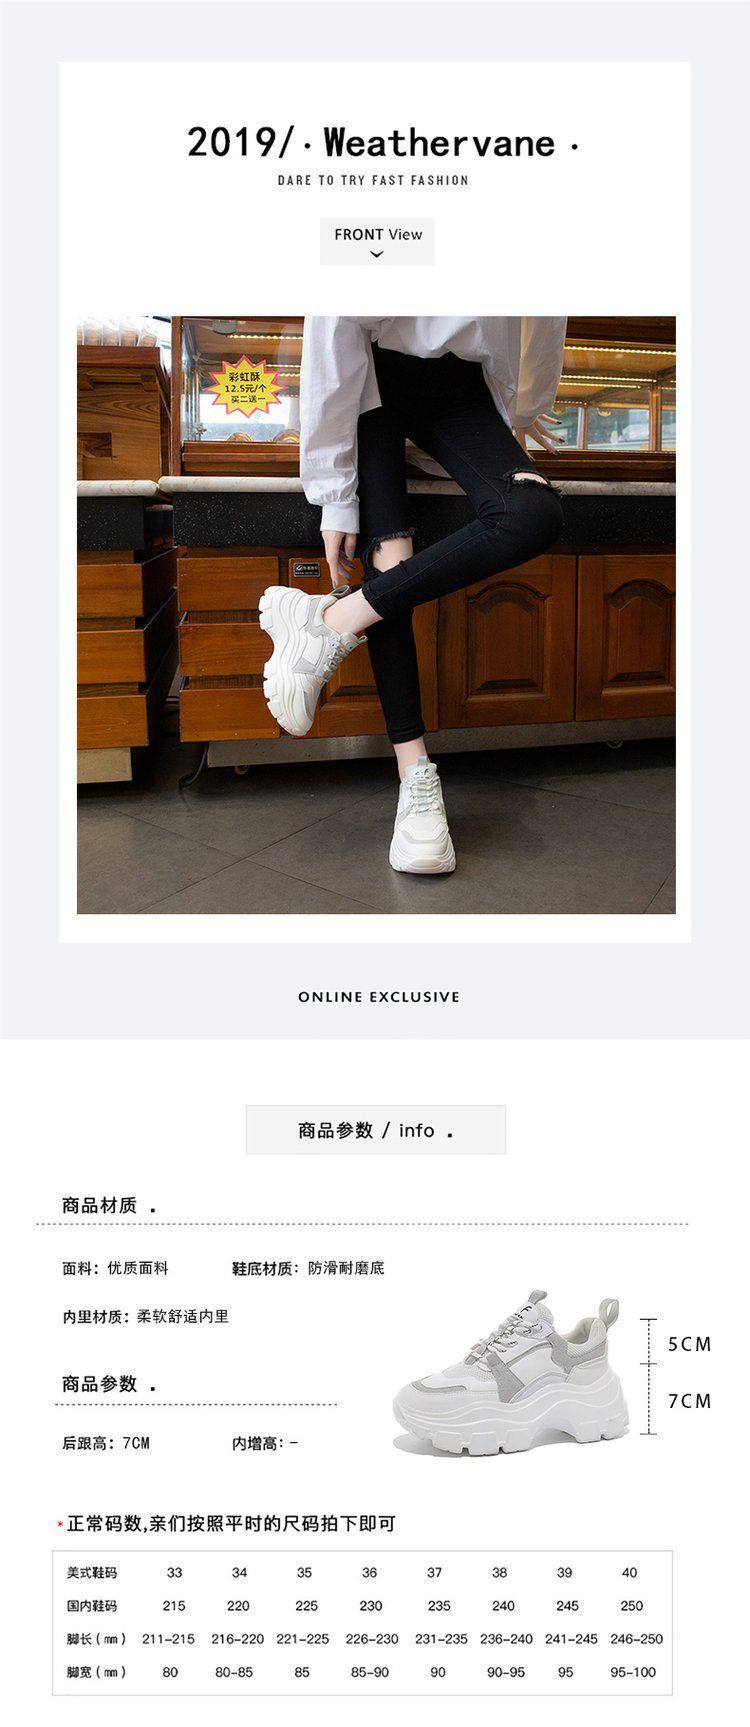 Women Chunky Sneakers Vulcanize Shoes Korean Fashion New Female Black White Platform Thick Sole Running Casual Shoe Woman 7cm